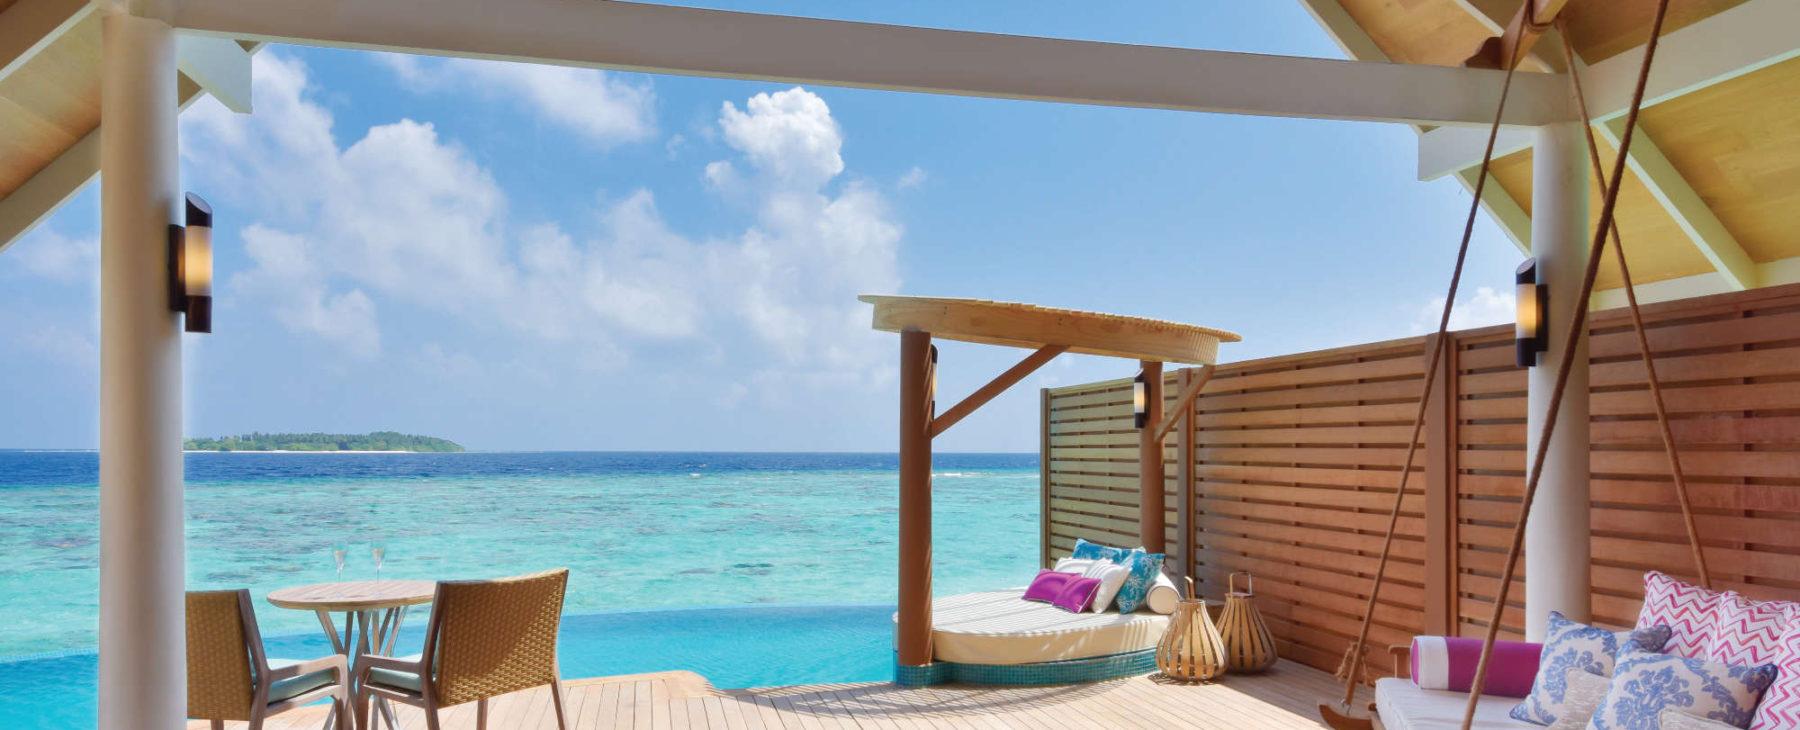 Luxusurlaub Milaidhoo Island Resort Malediven Luxury Circle